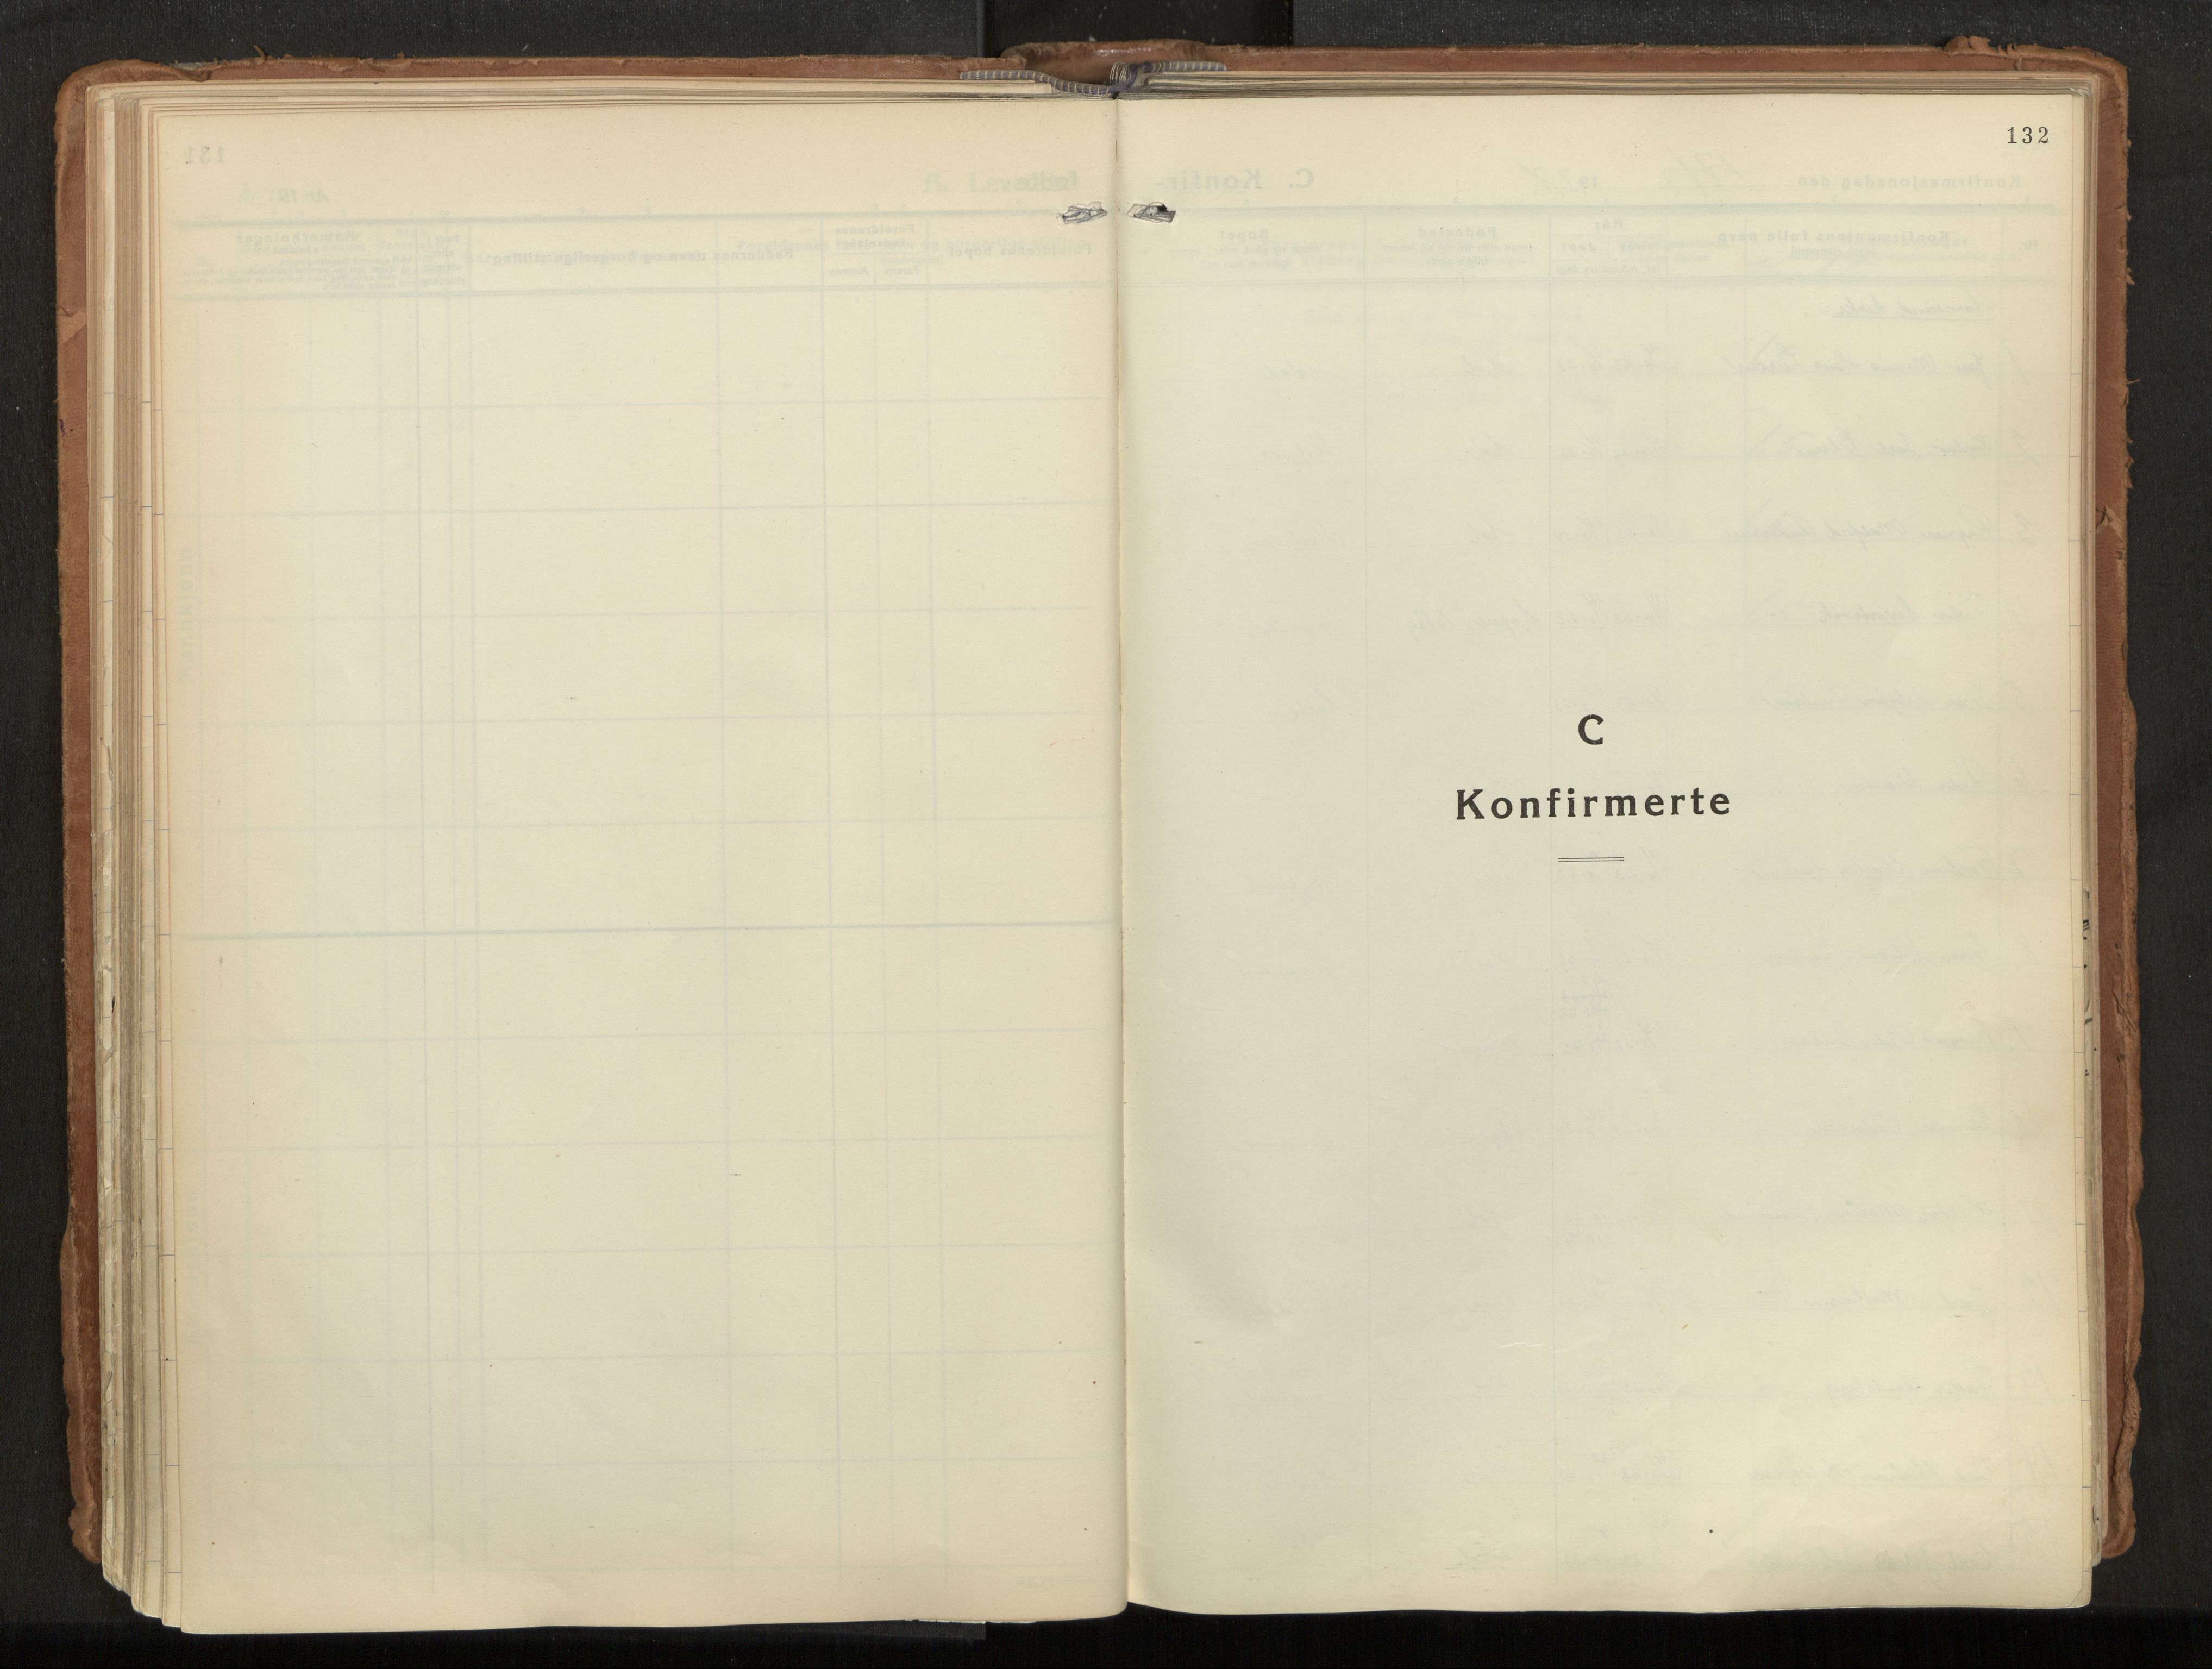 SAT, Ministerialprotokoller, klokkerbøker og fødselsregistre - Nordland, 882/L1182: Ministerialbok nr. 882A04, 1932-1950, s. 132